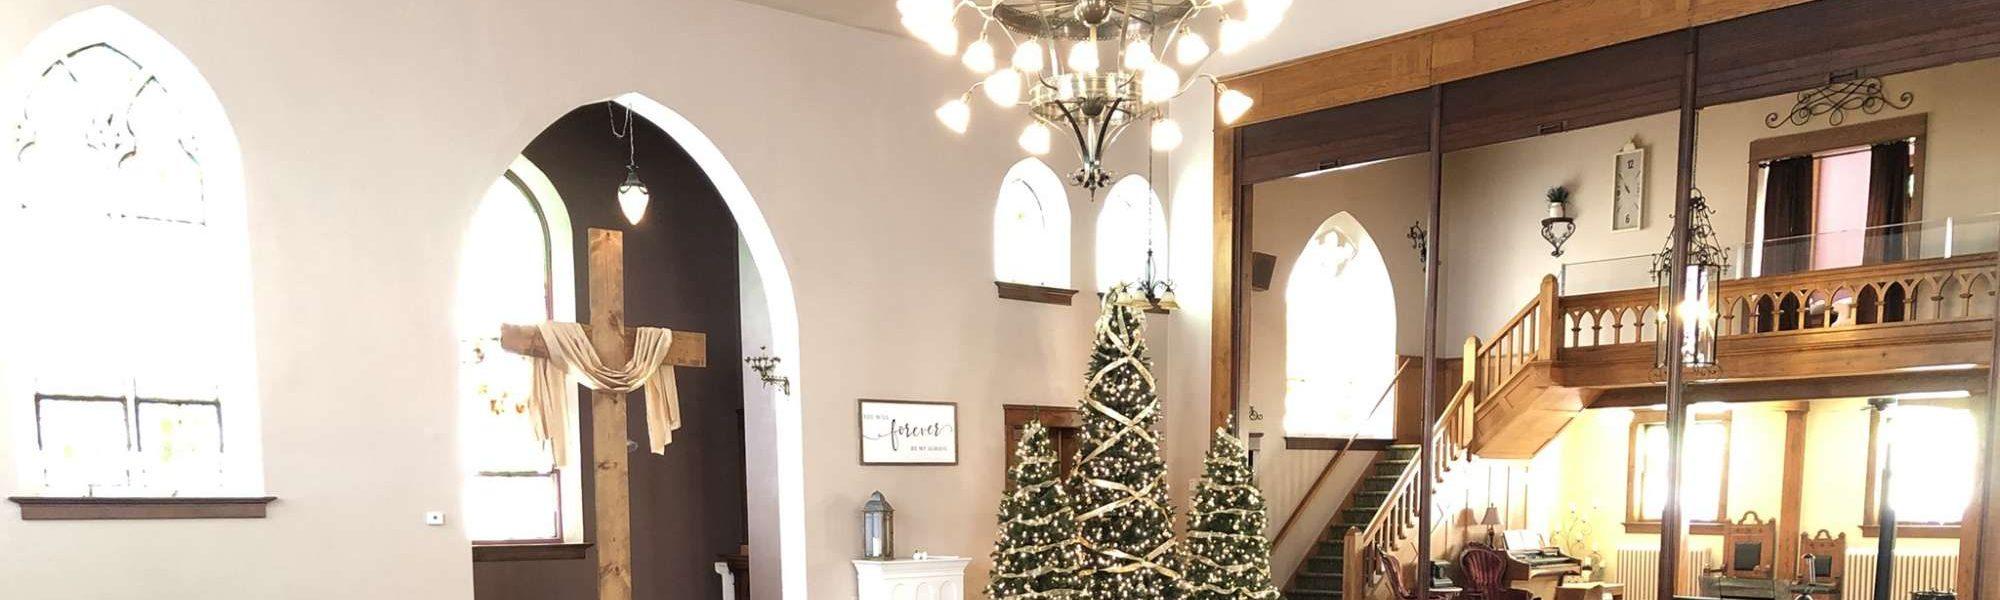 Devotions Wedding Chapel at Christmastime